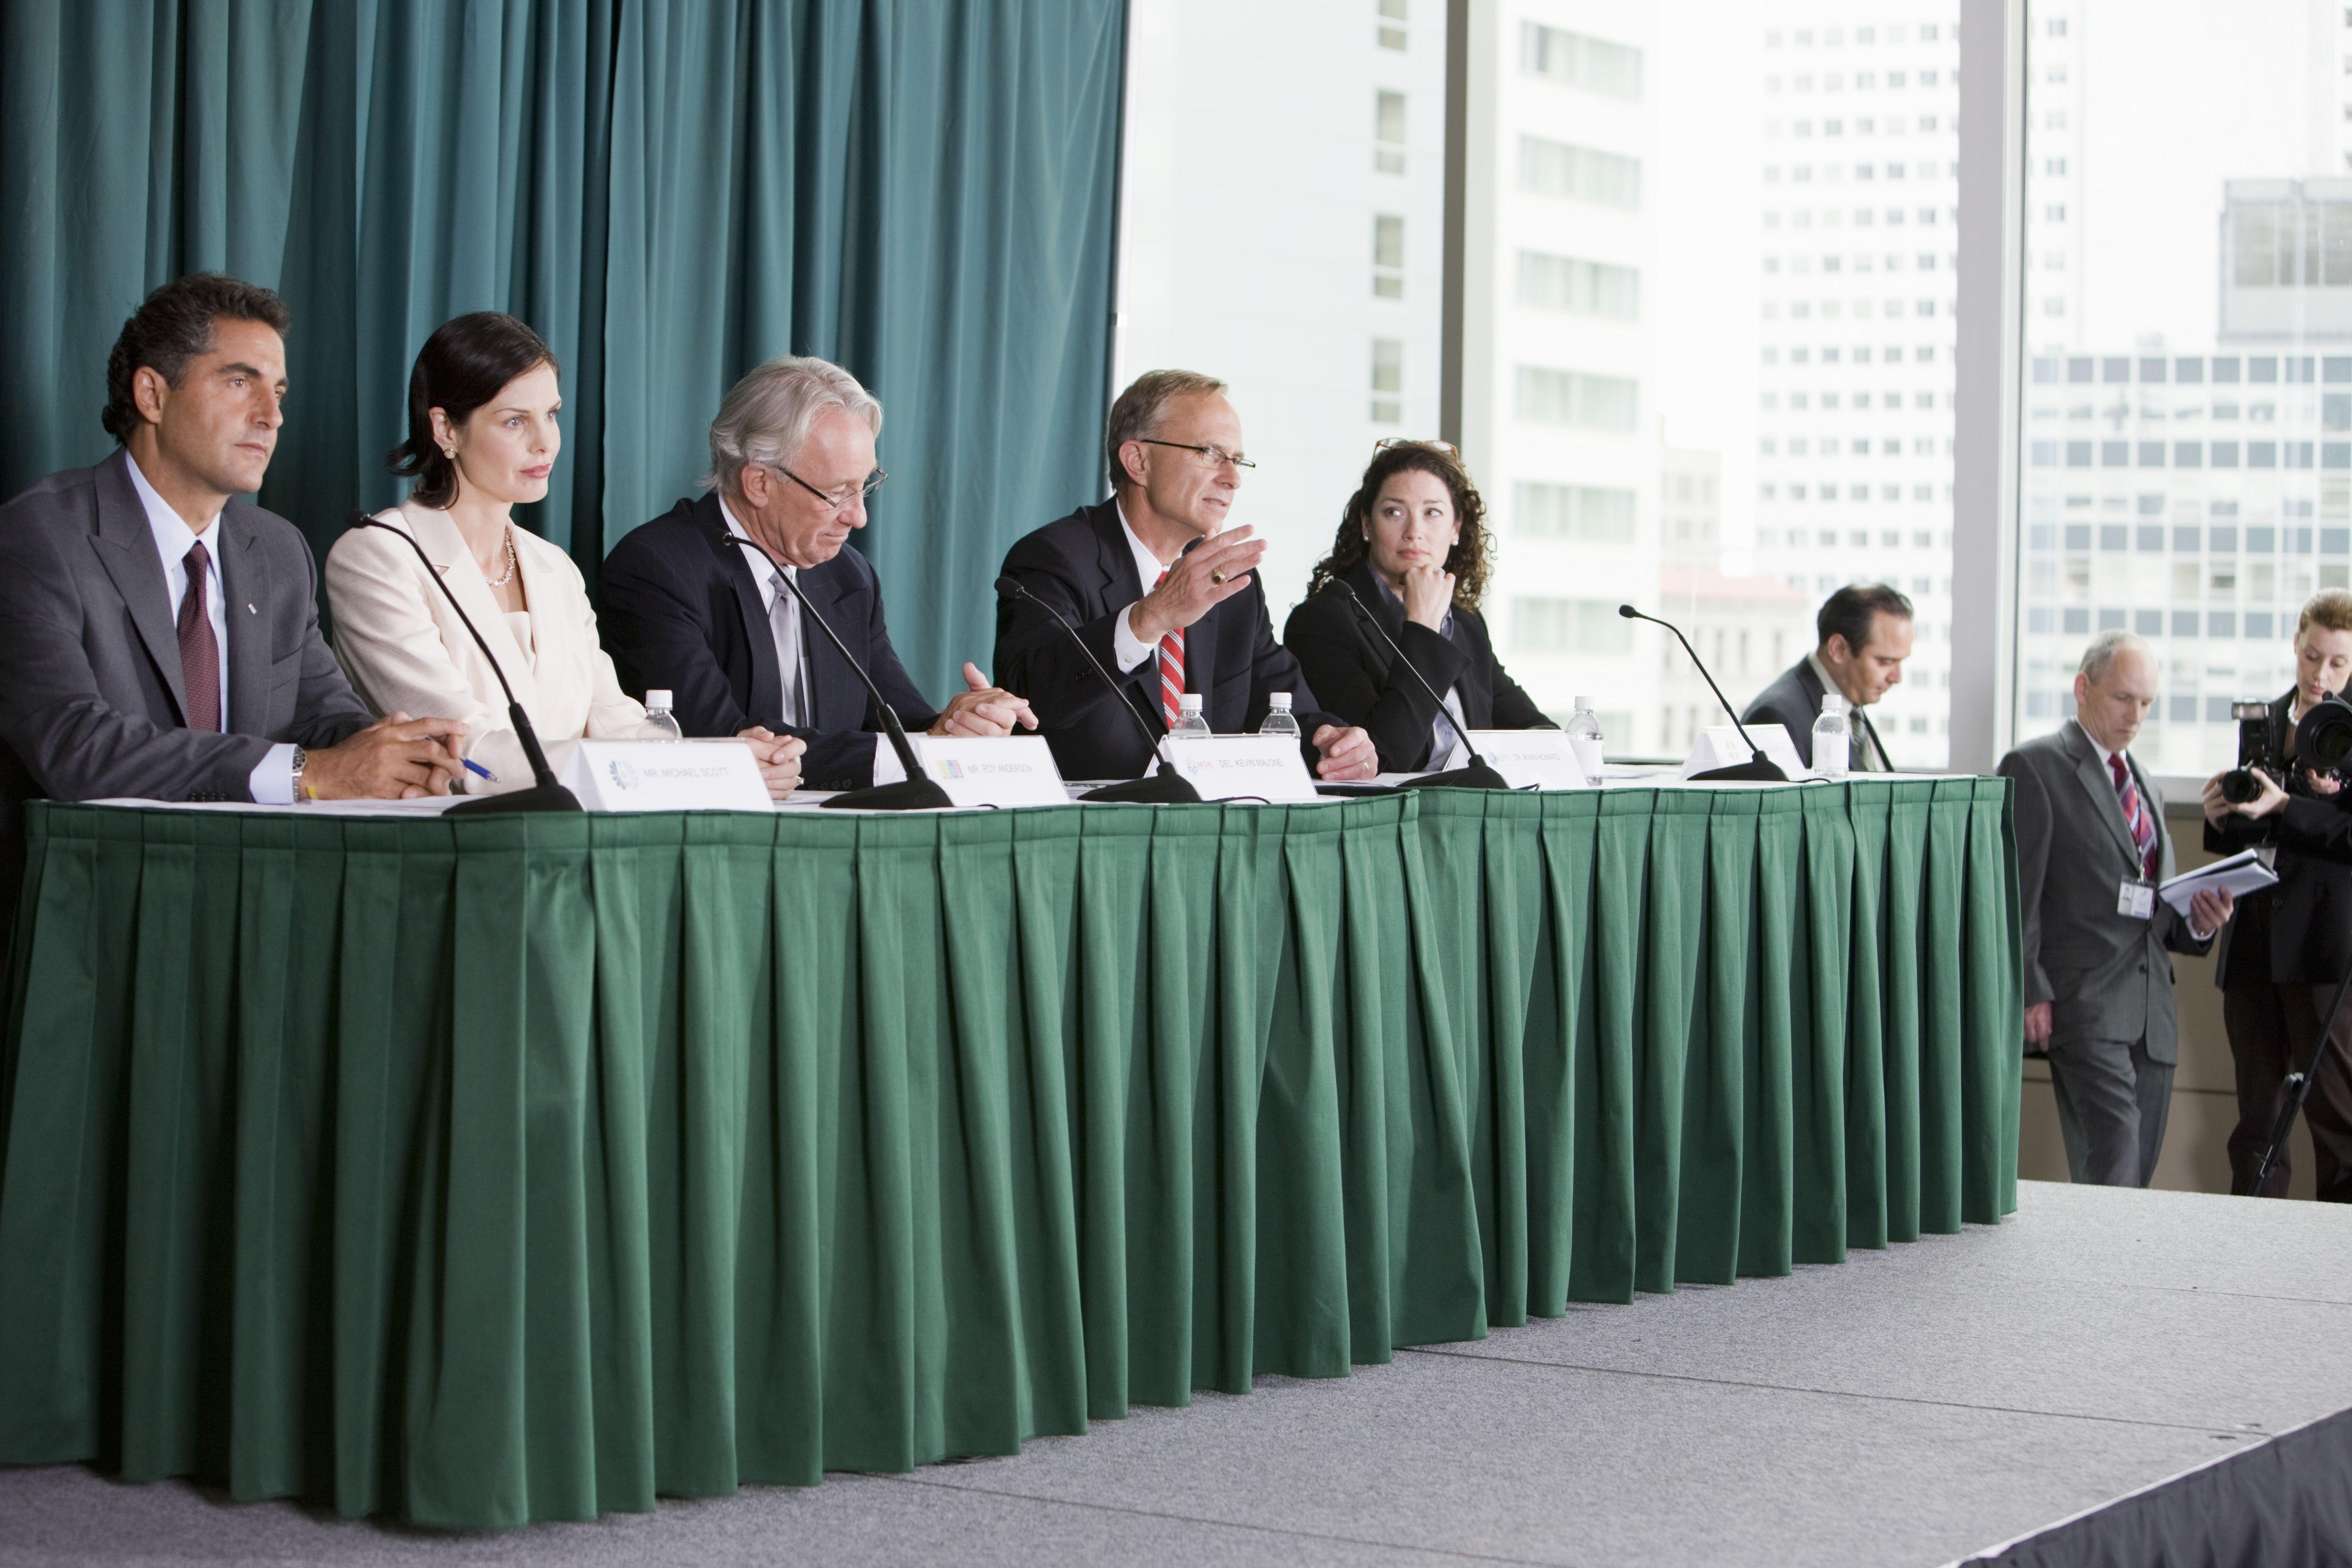 Business people on seminar panel